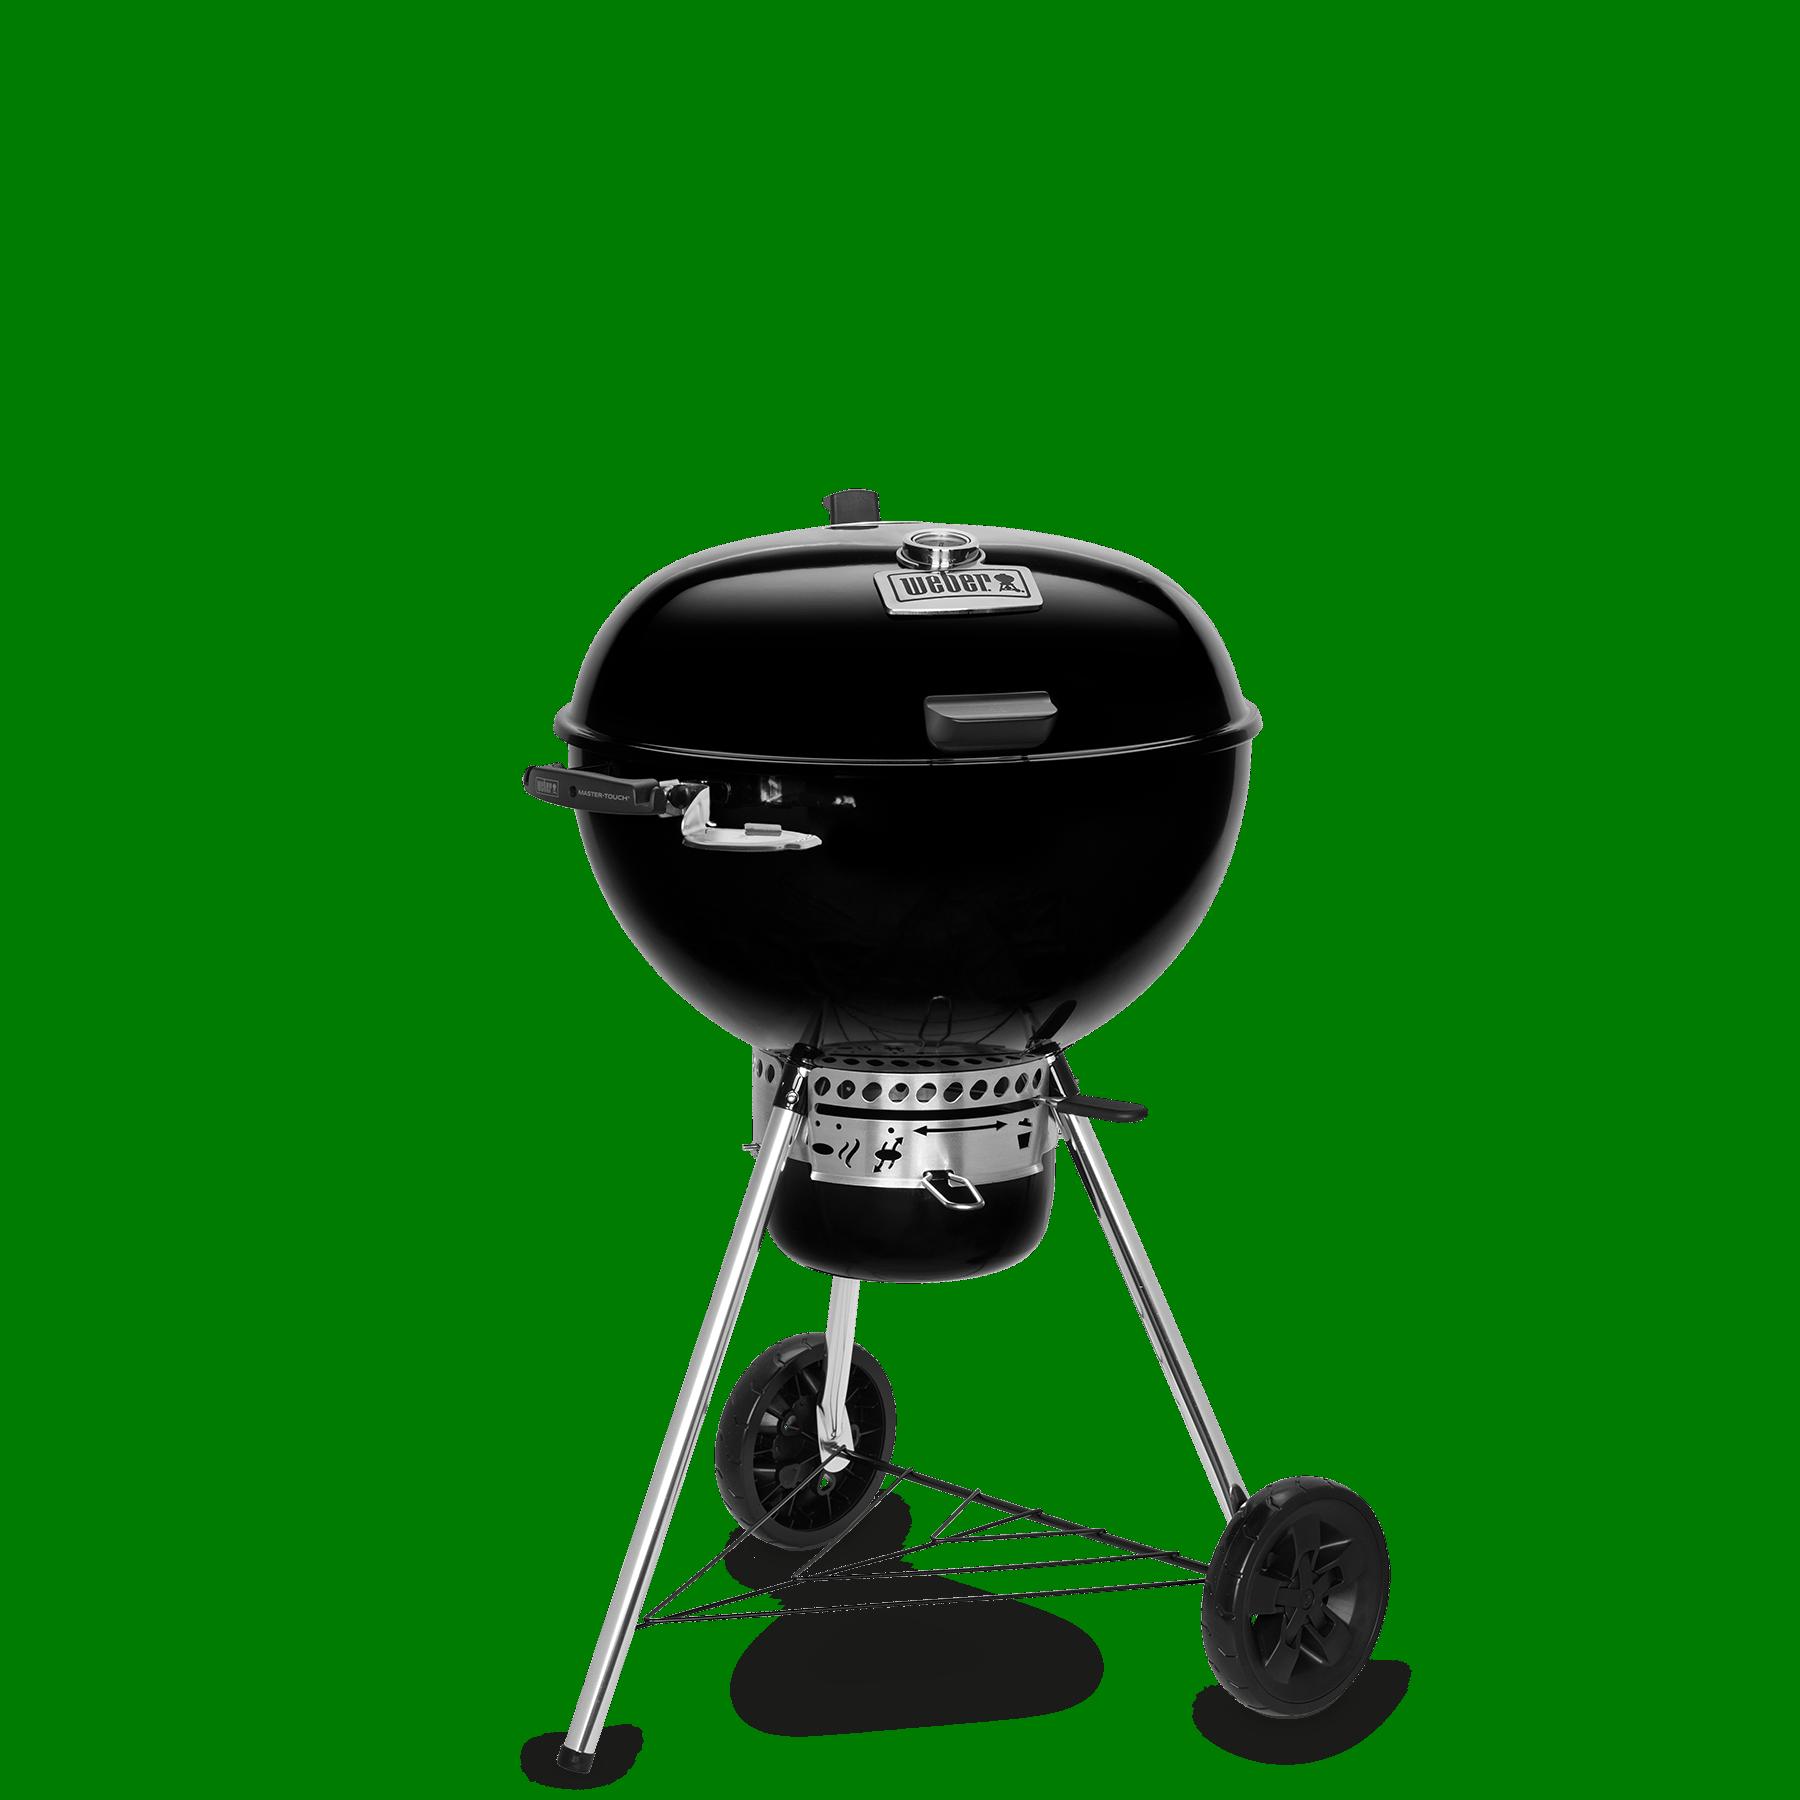 Master-Touch GBS Premium SE E-5775 Charcoal Barbecue 57 cm